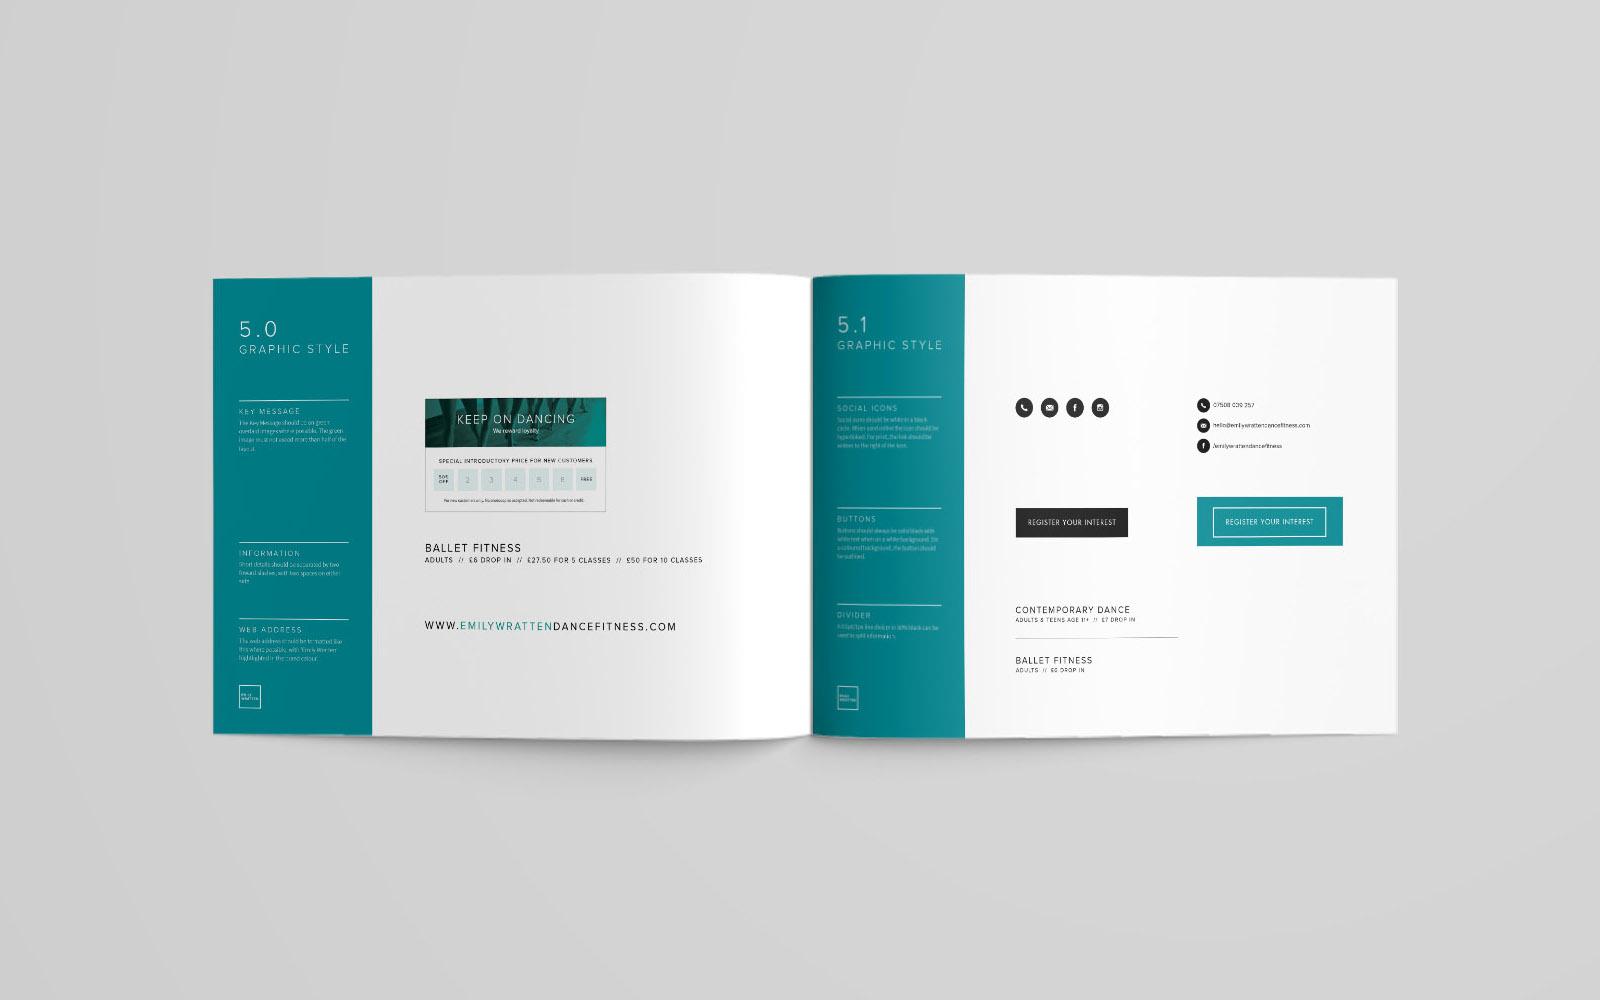 tinybeastdesign-emilywrattendancefitness-guidesline3